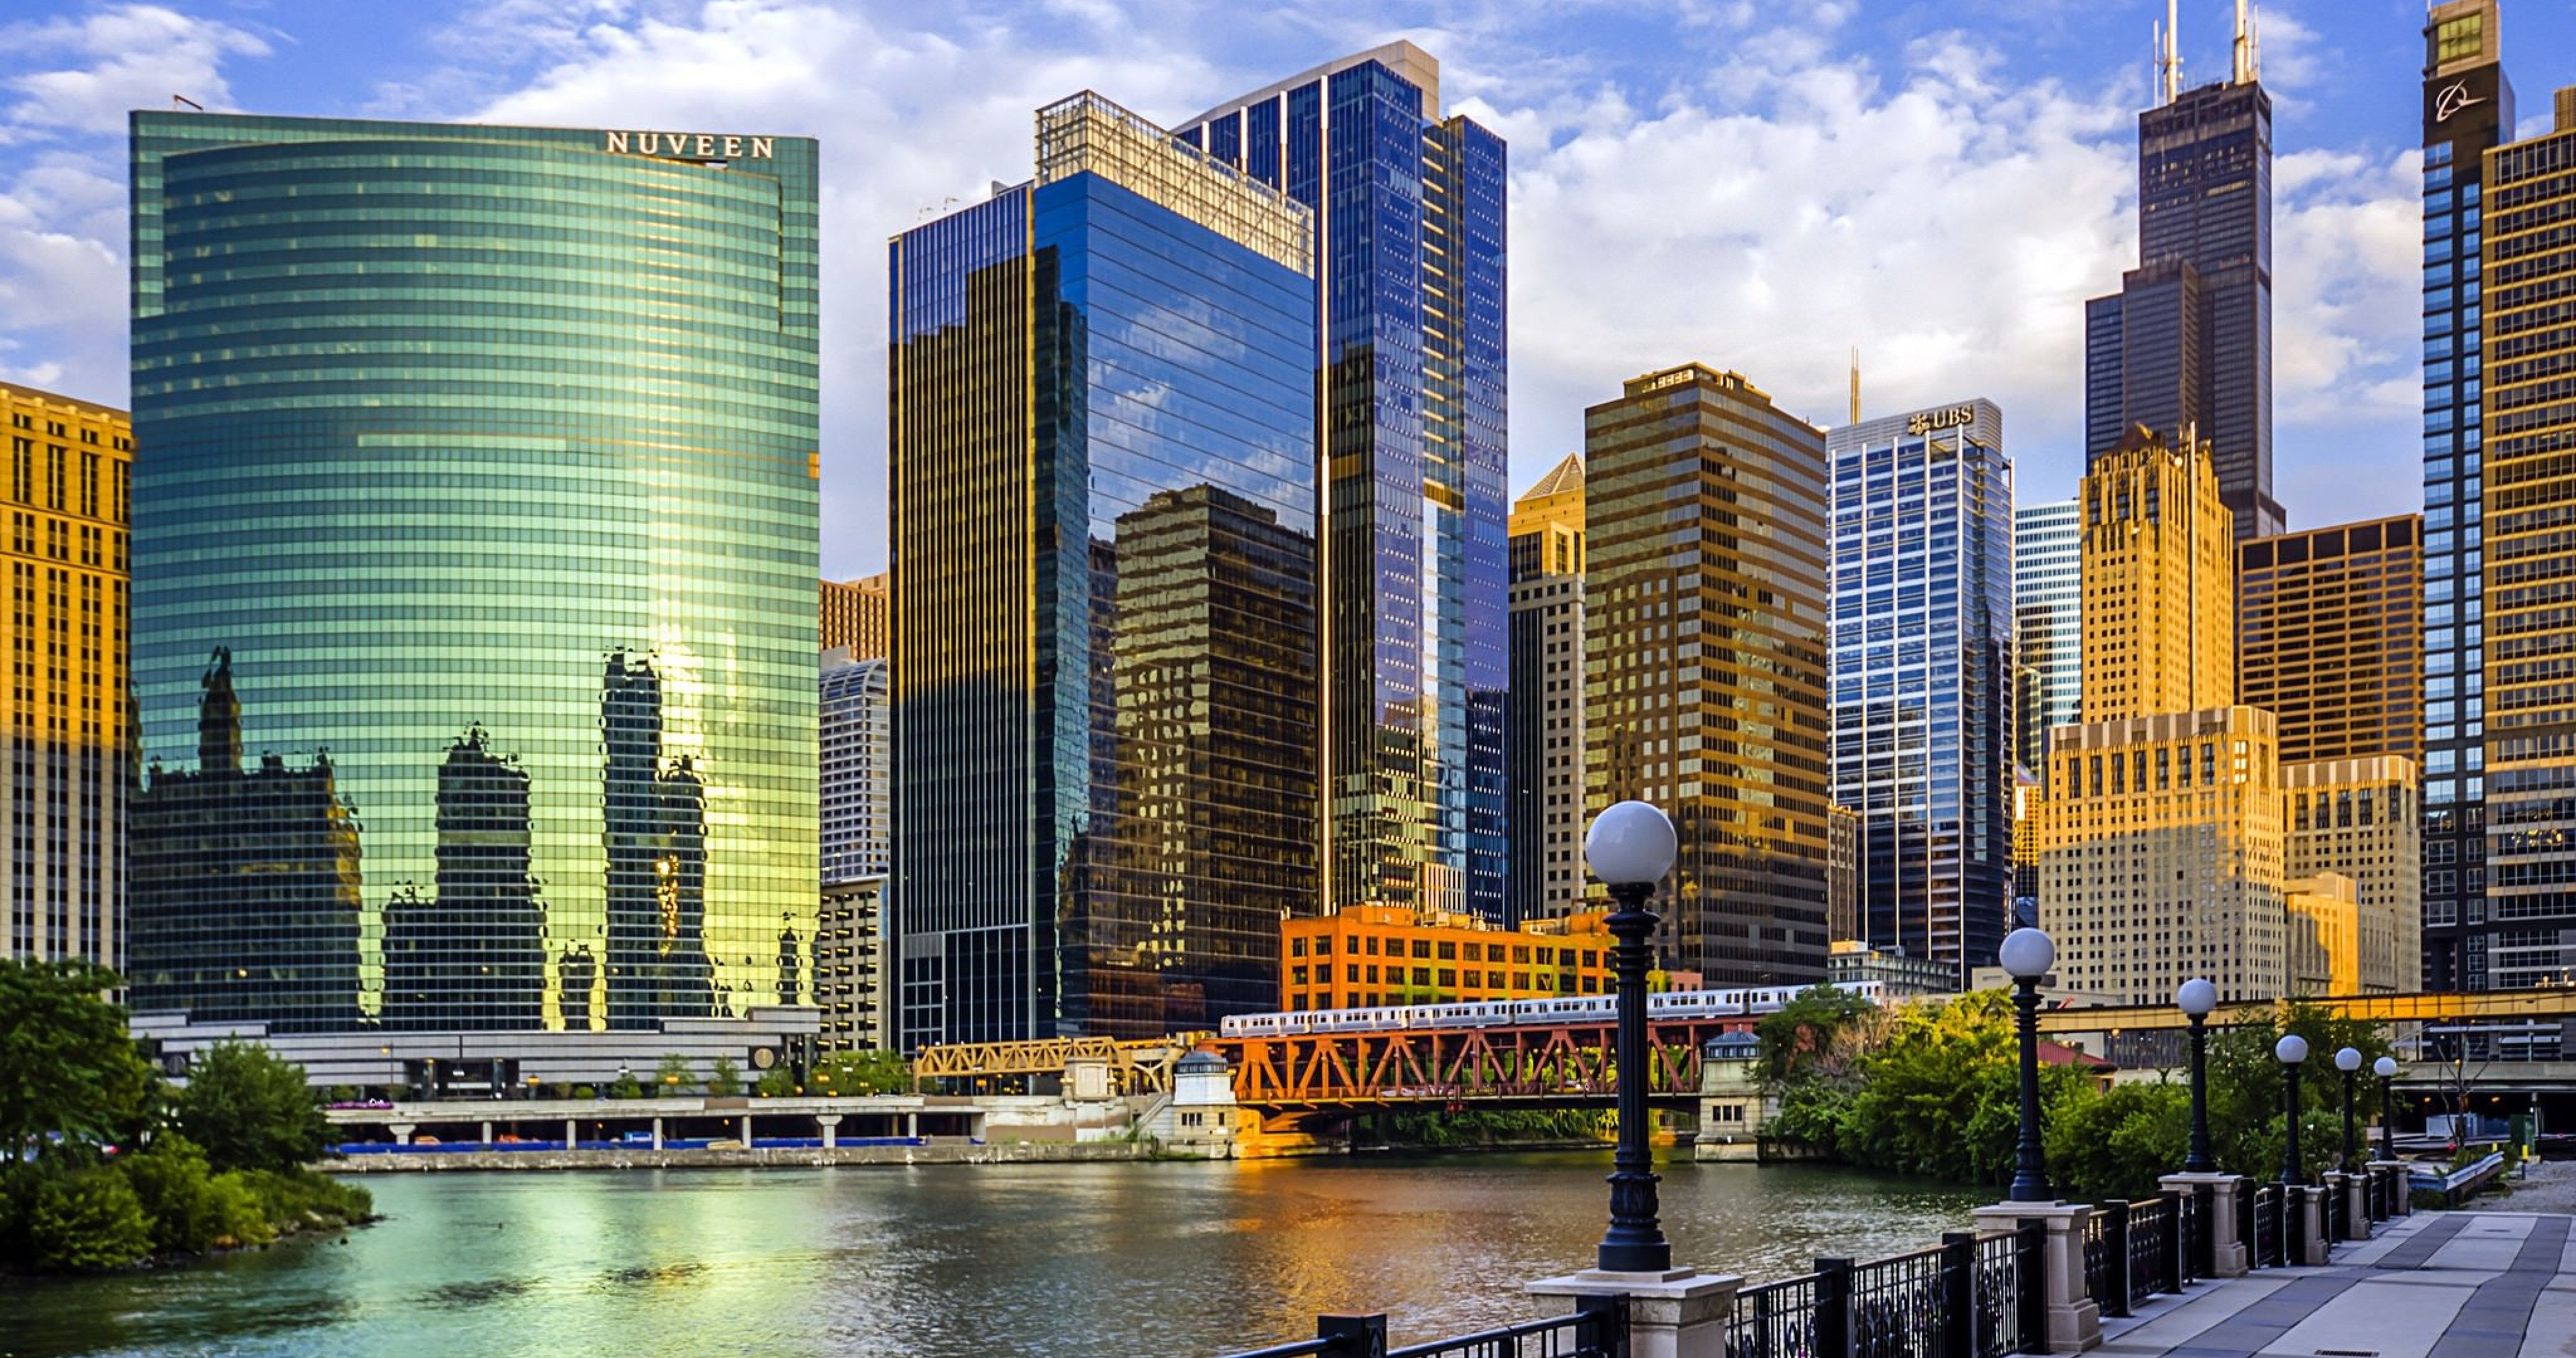 Chicago Illinois 4k Ultra Hd Wallpaper Chicago River Best Cities River Art